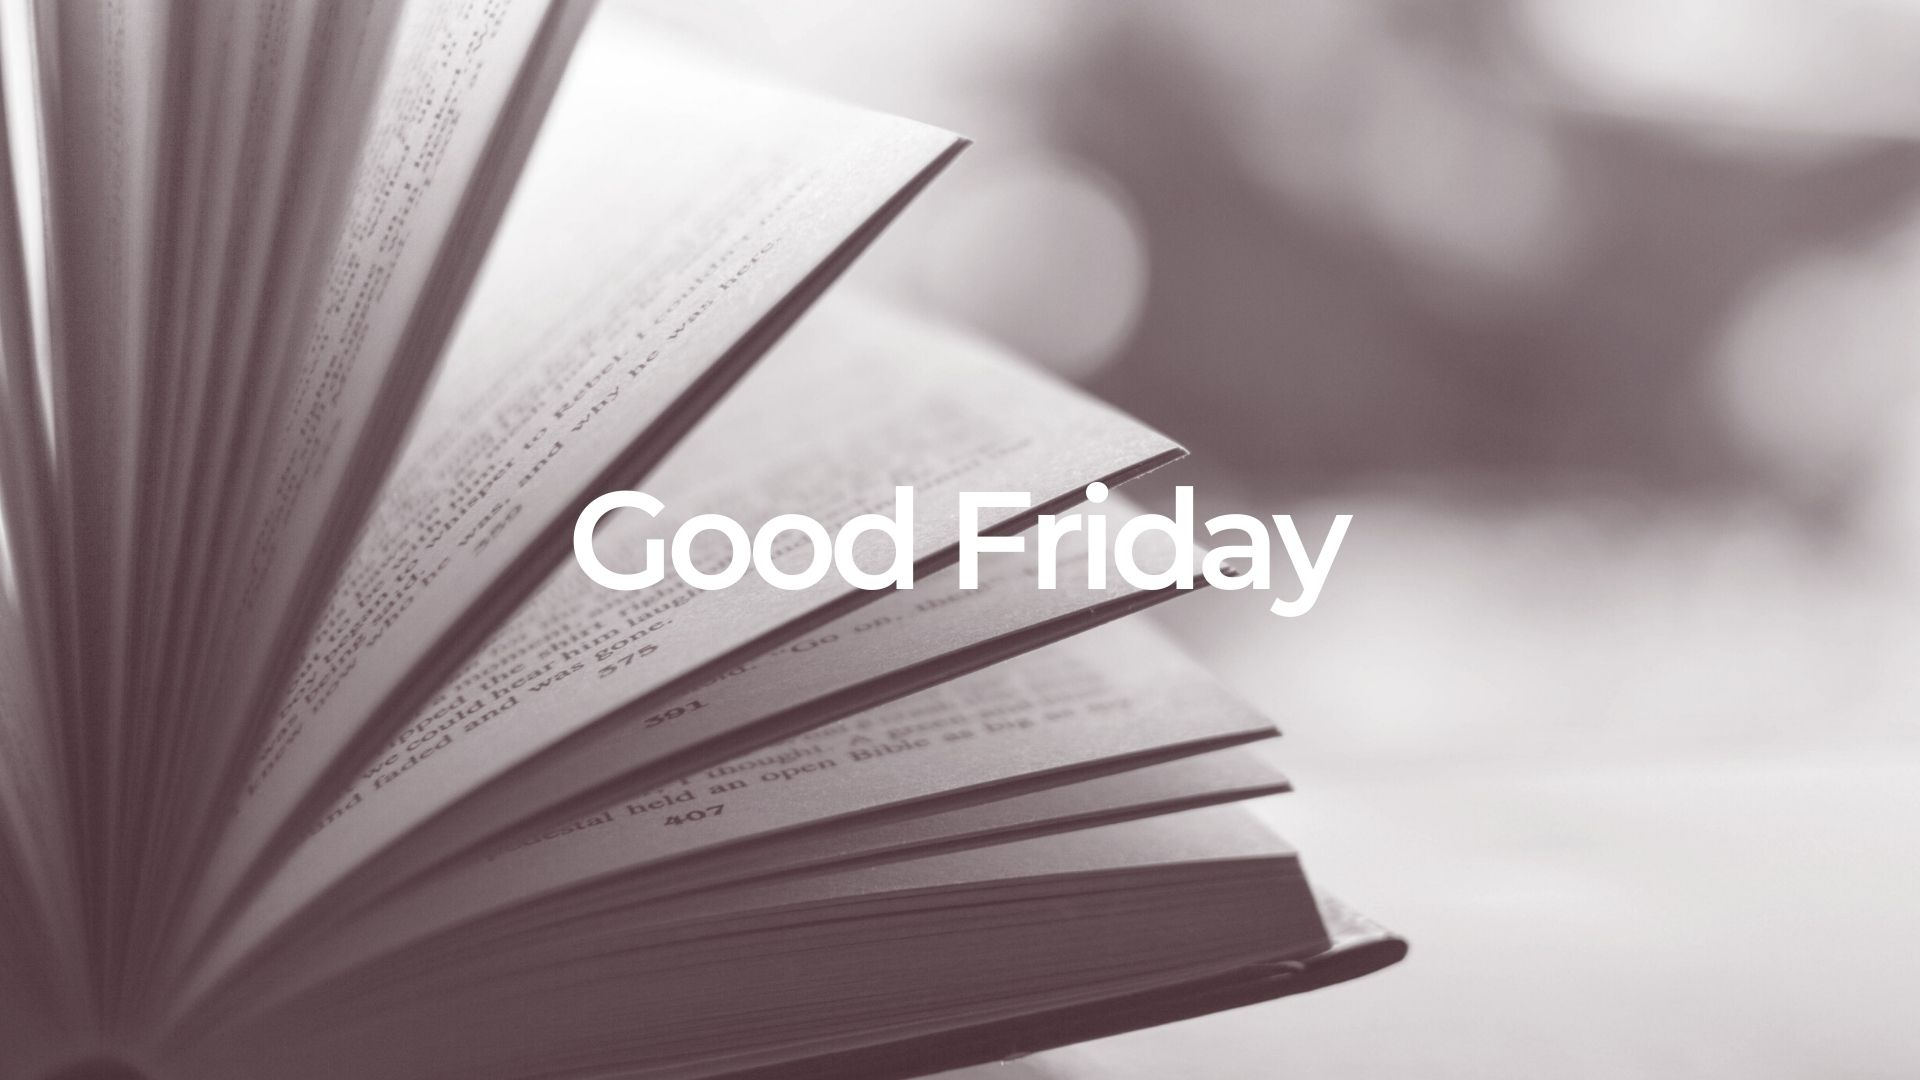 Good Friday: I Have Taken Away Your Sin – Zechariah 3:3-4